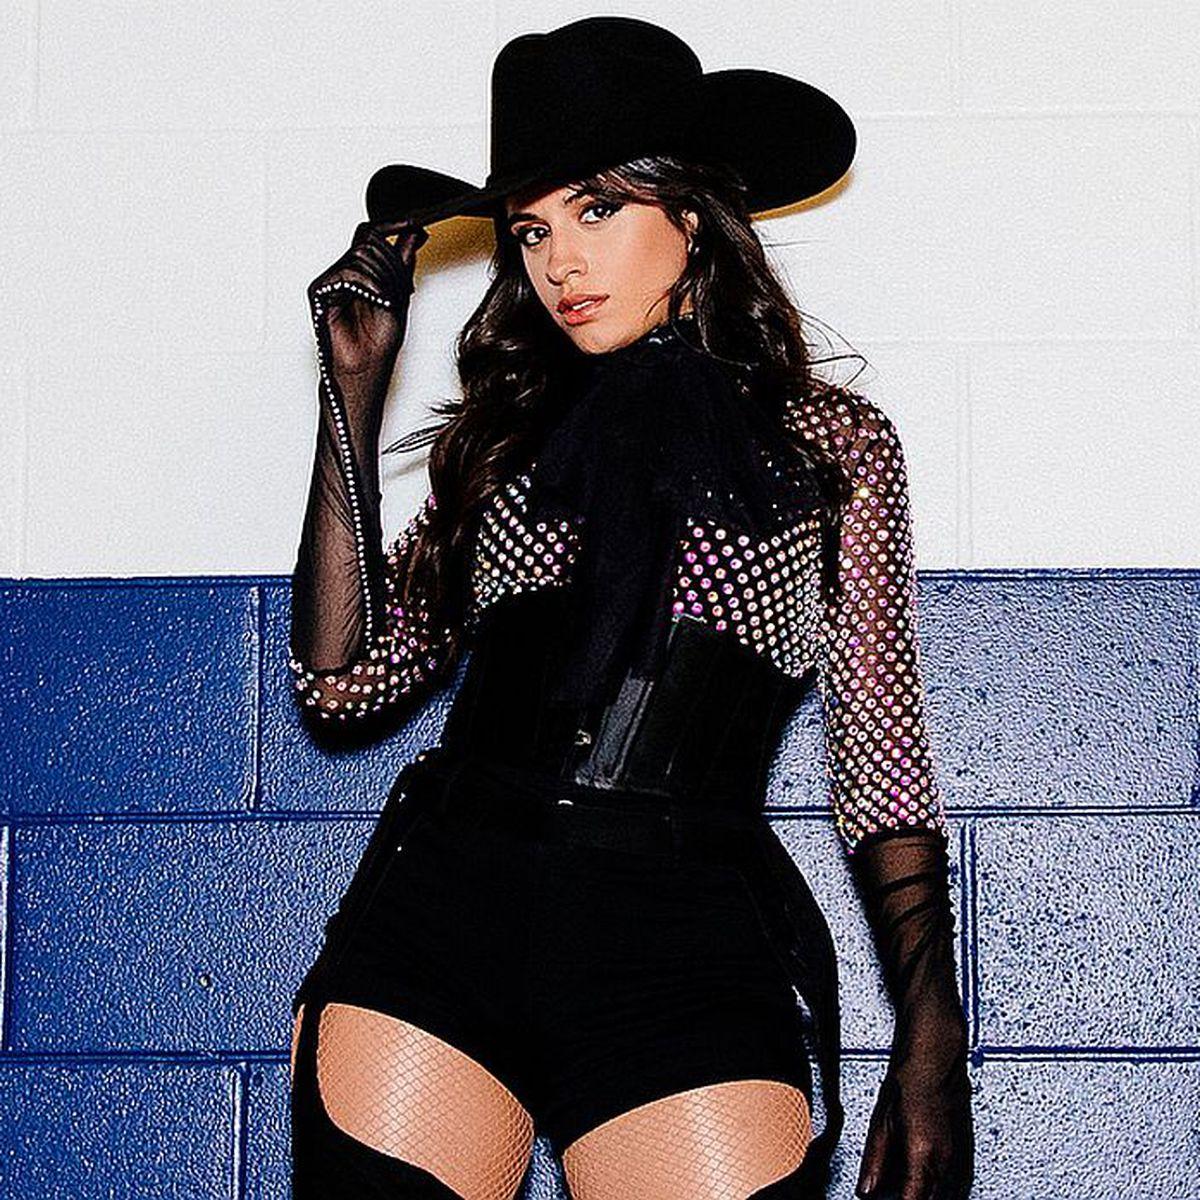 Homenaje Quintanilla Camila Cabello Le A Selena Rindió CxodeB